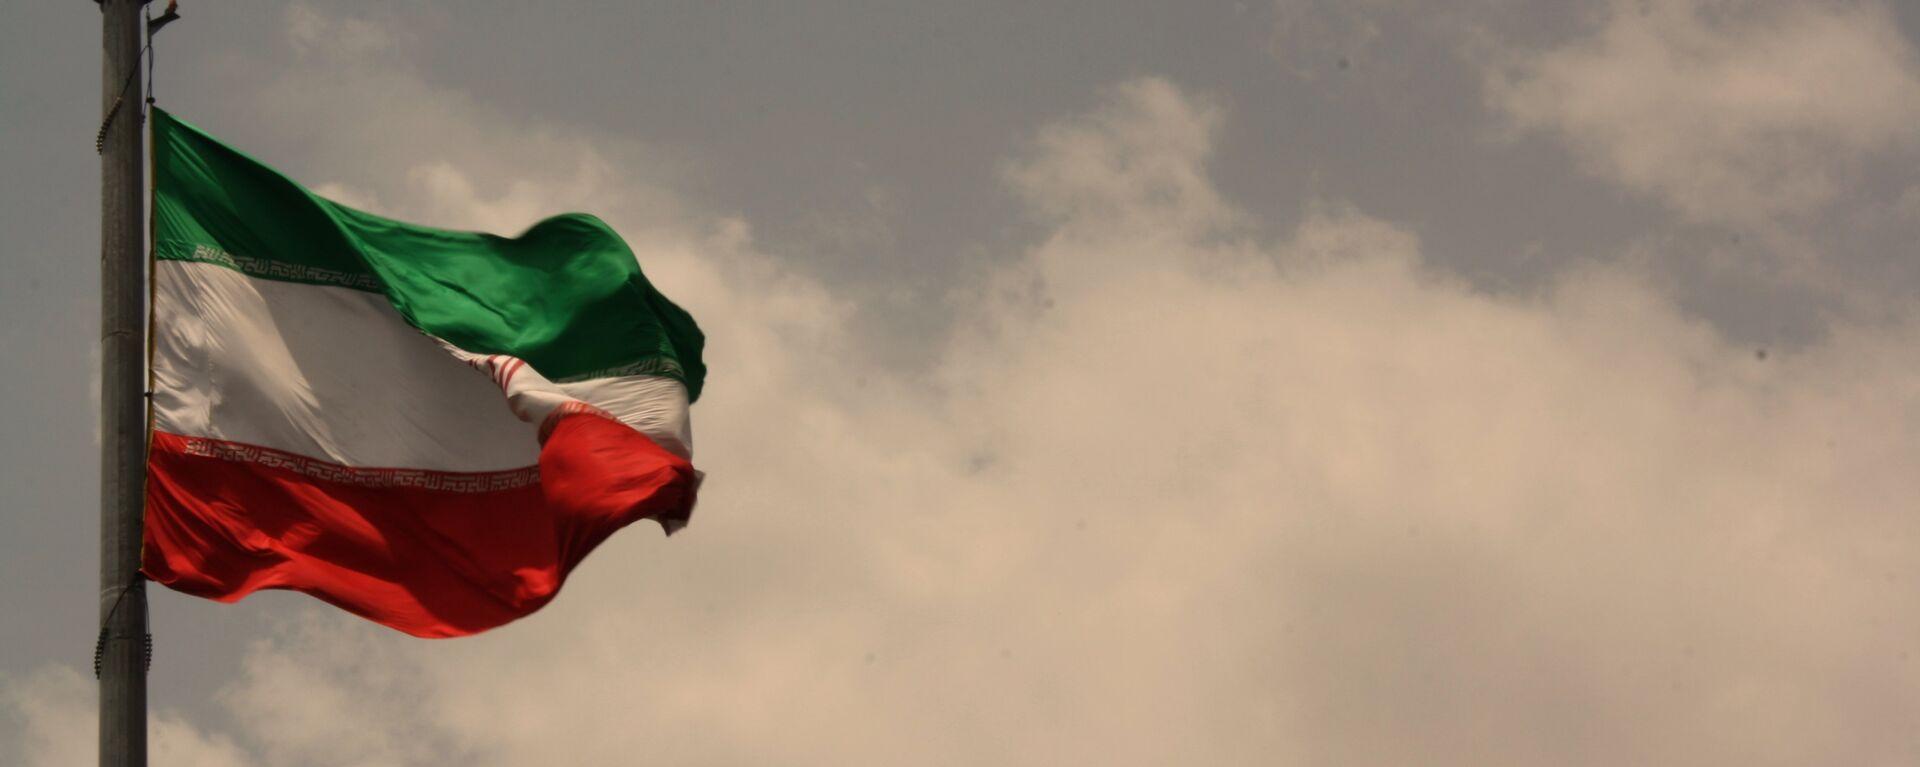 La bandera de Irán - Sputnik Mundo, 1920, 08.02.2021